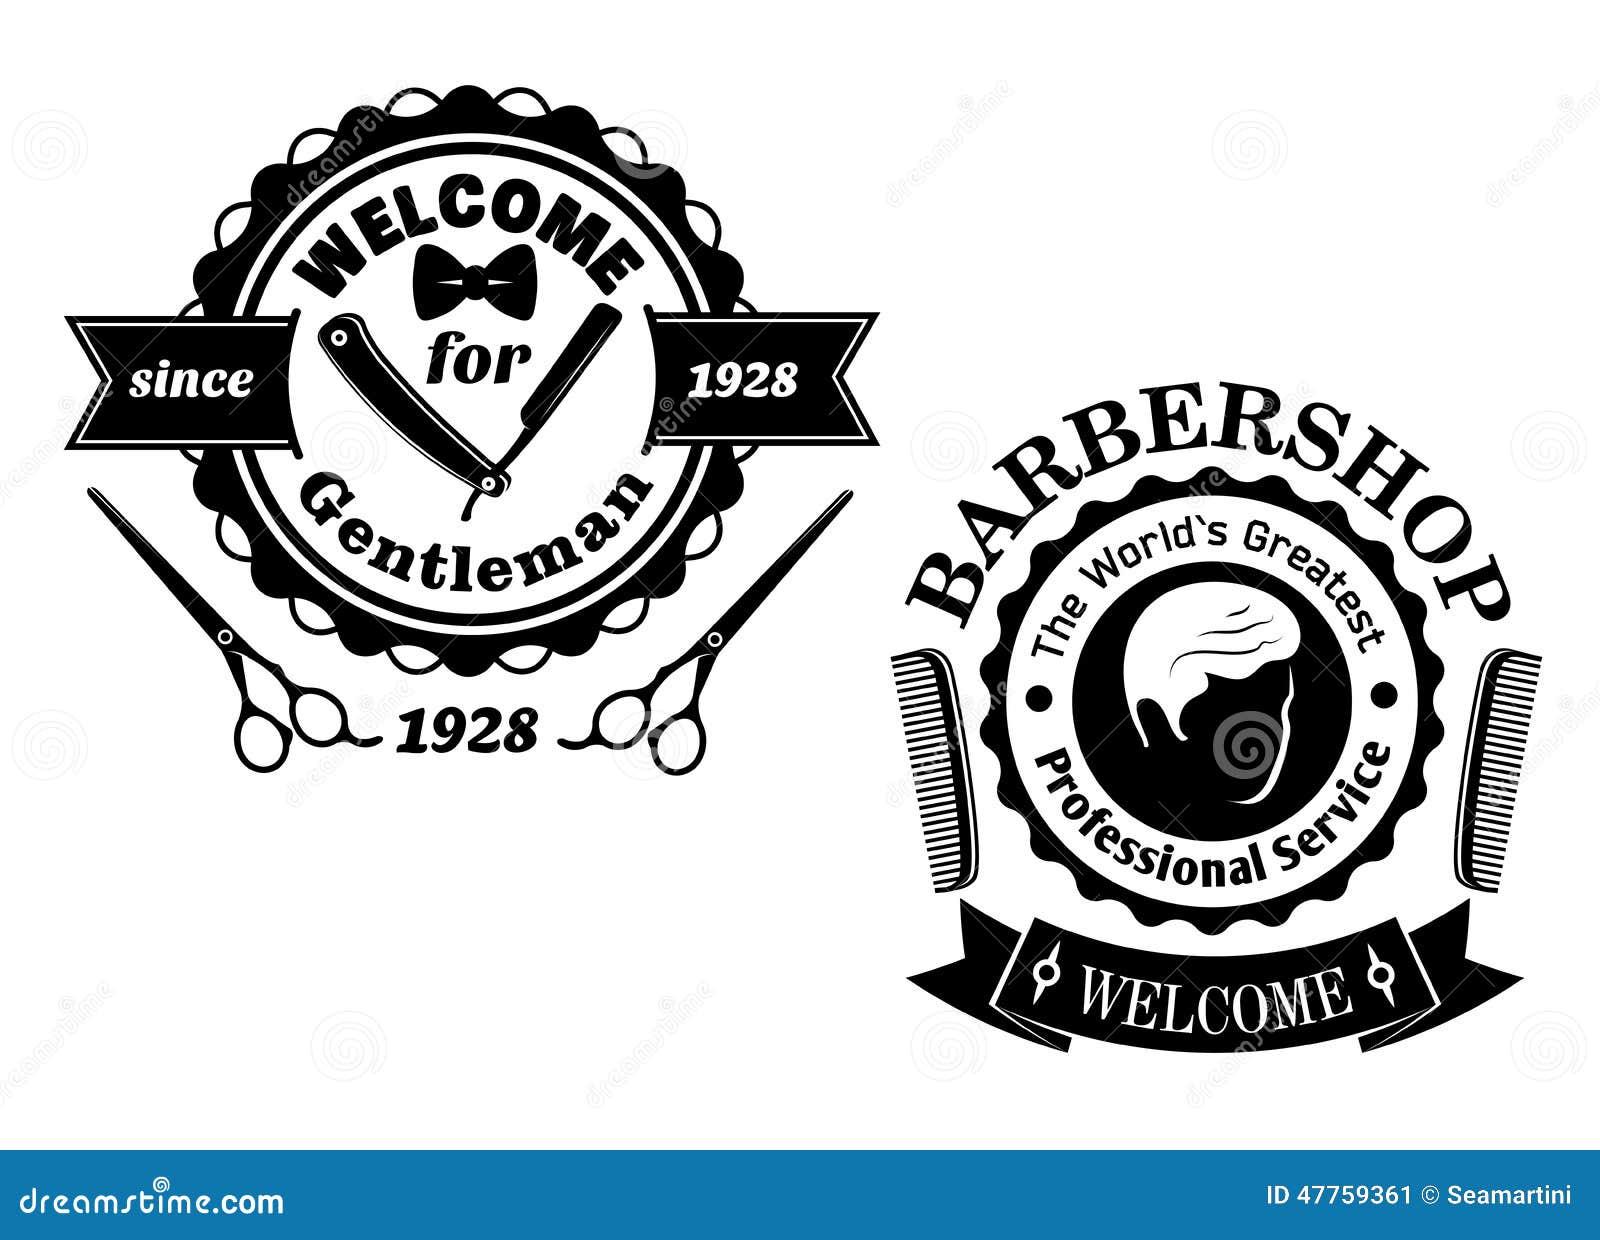 Clip art vector of vintage barber shop logo graphics and icon vector - Royalty Free Vector Barber Razor Scissors Shop Vintage